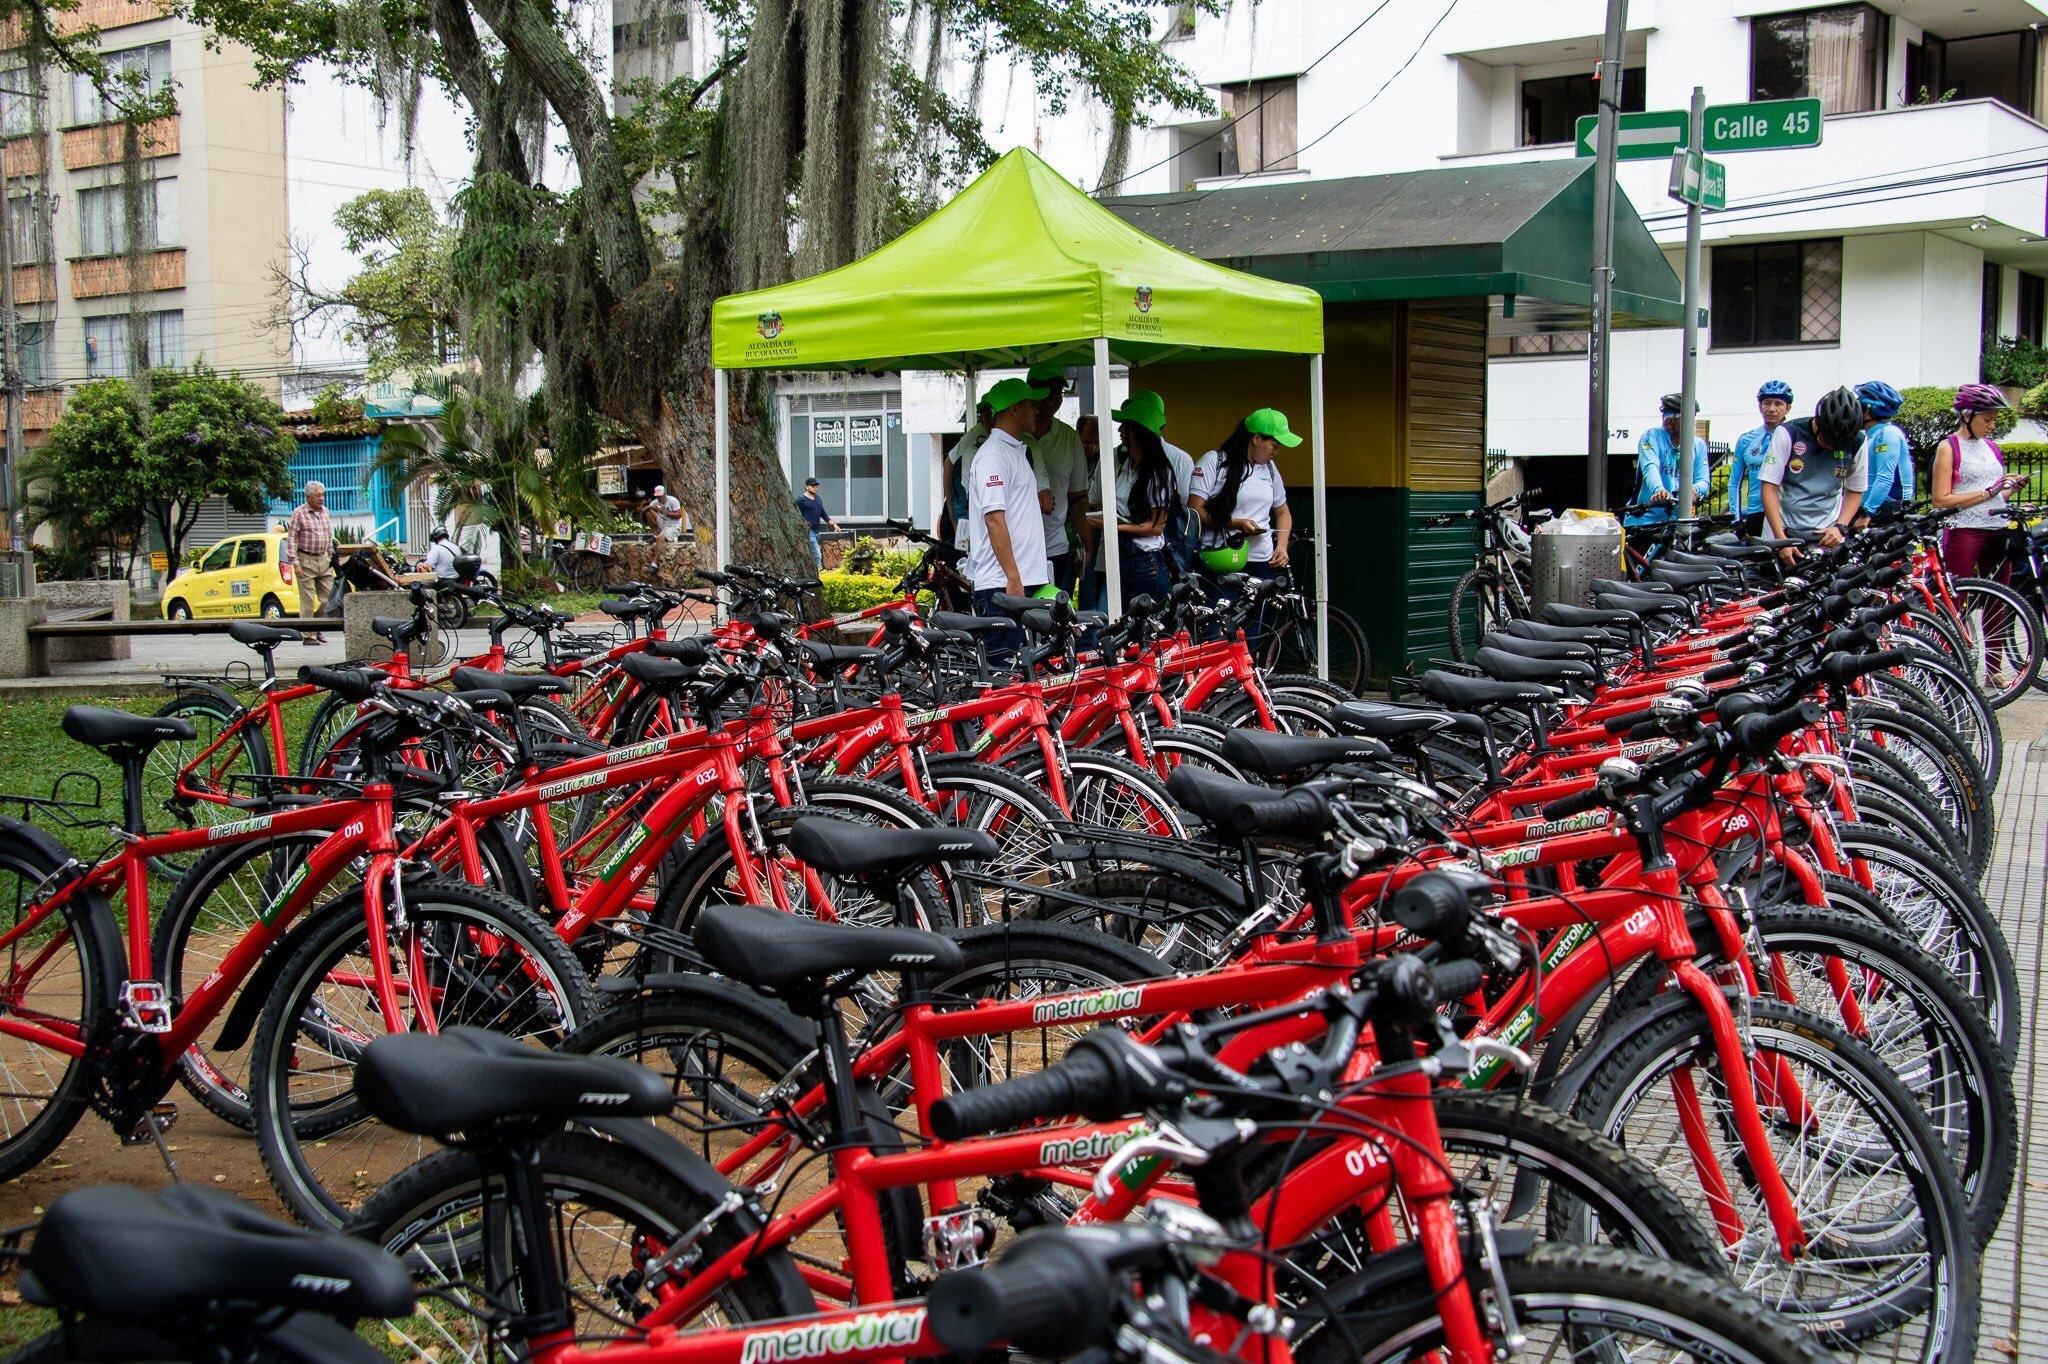 Comenzó a operar de nuevo Metrobici en Bucaramanga | Bucaramanga | Metro | EL FRENTE